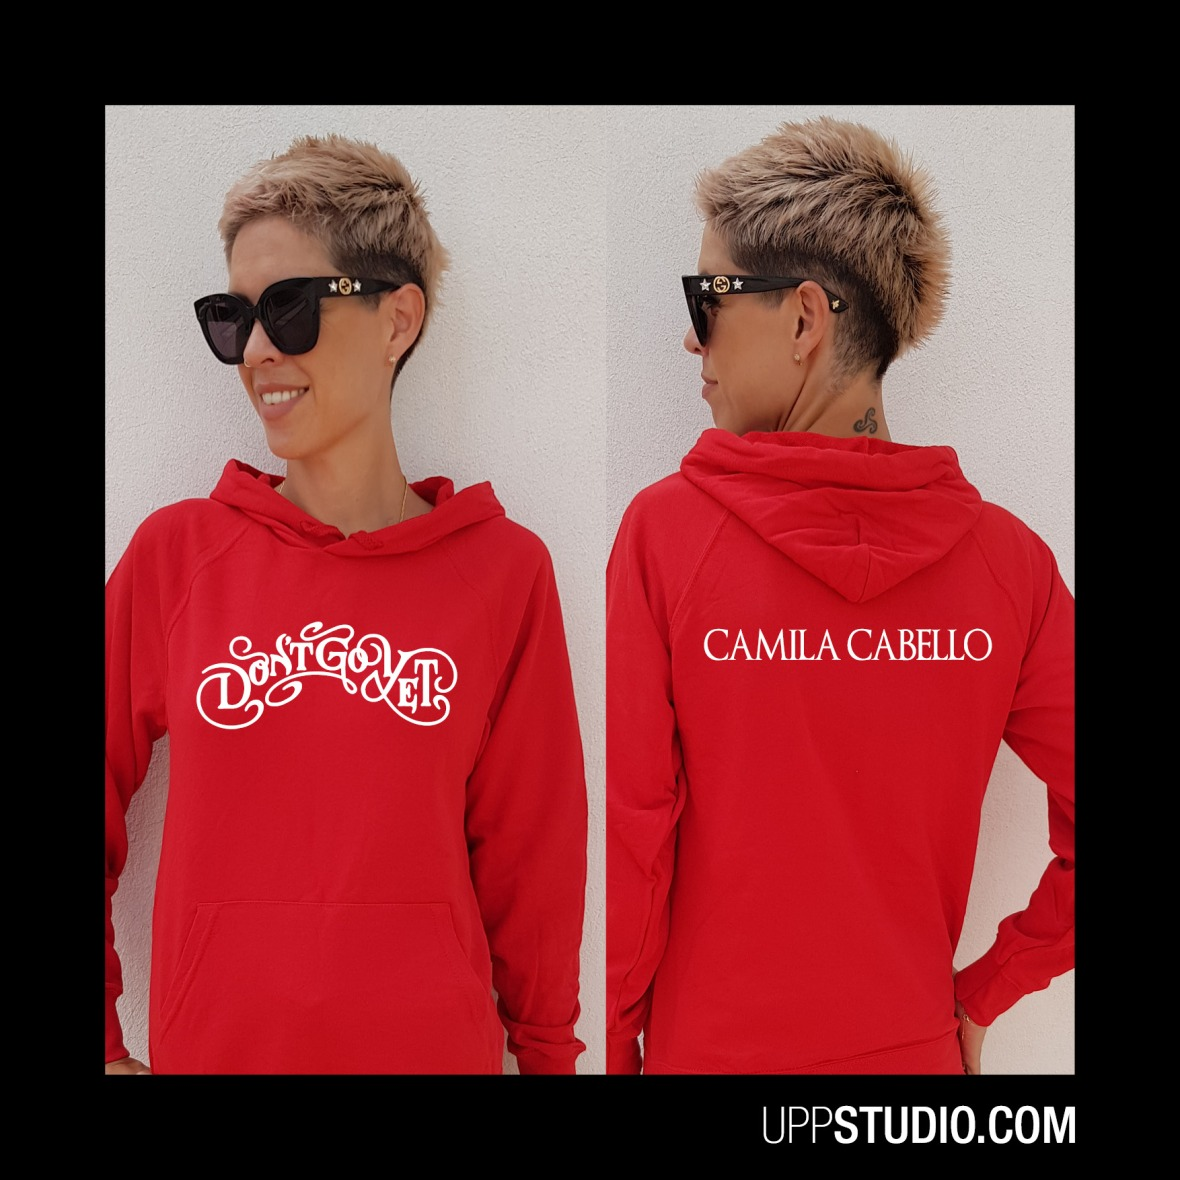 Sudadera Don't Go Yet Camila Cabello Hoodie Camiseta Felpa Sweatshirt Familia Comprar Barata Buy Cheap